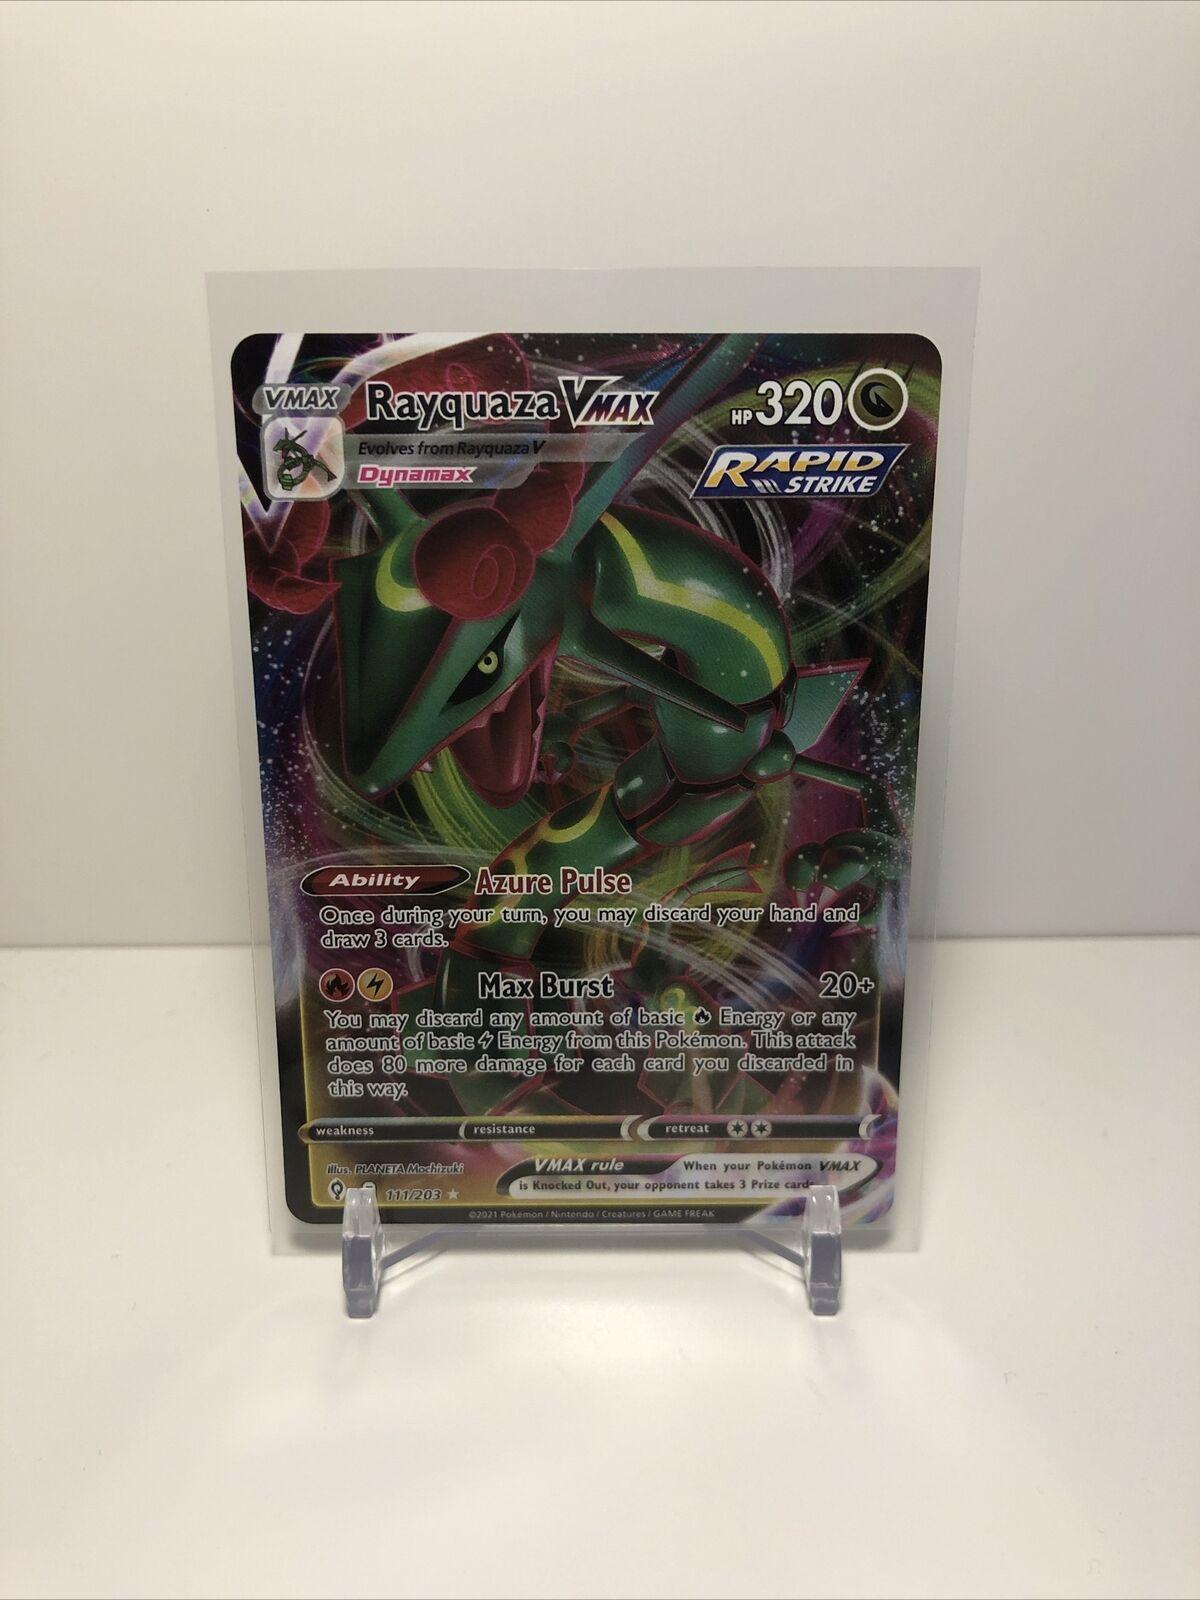 Rayquaza VMAX Pokémon Card (Evolving Skies 111/203) Ultra Rare